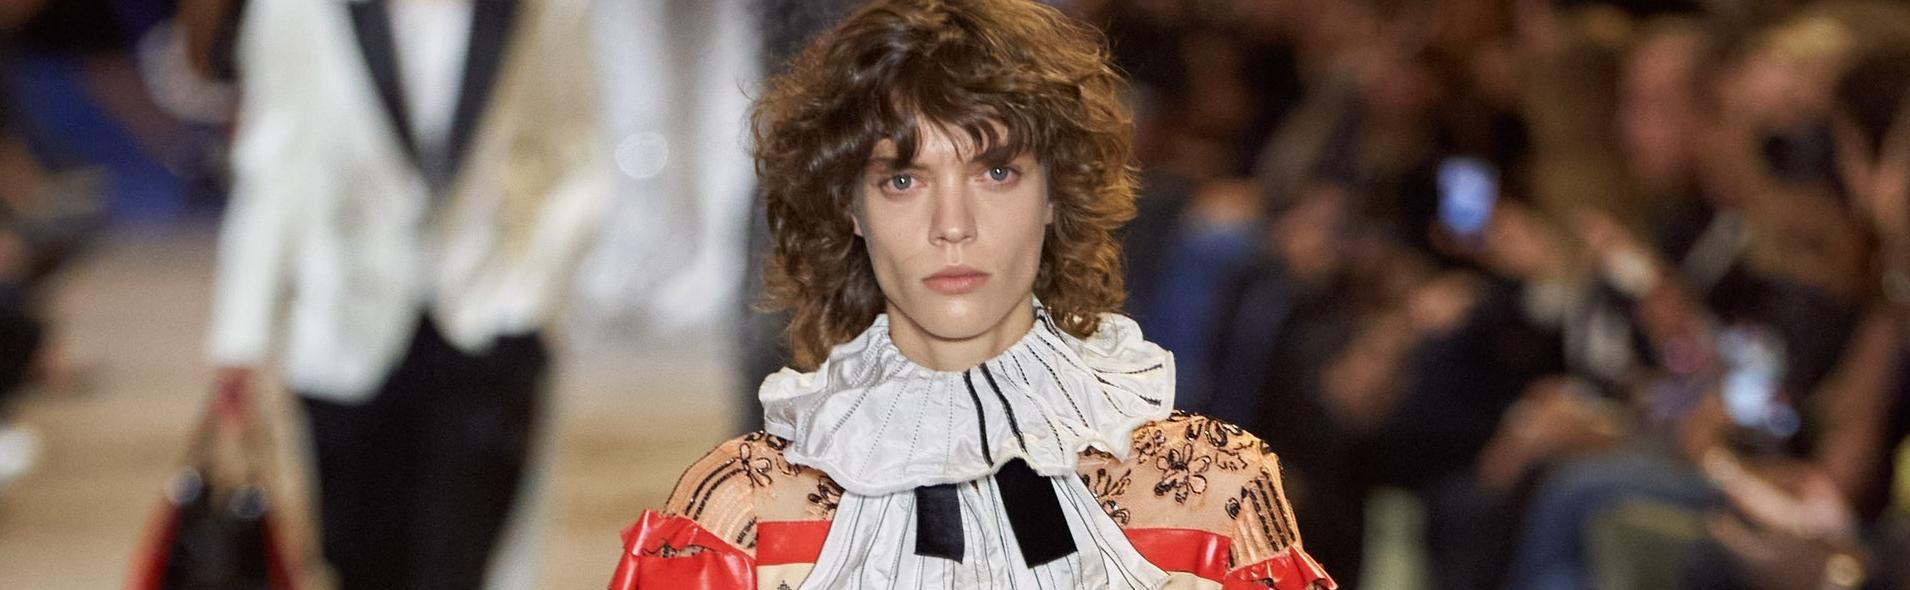 Louis Vuitton, Spring 2022, READY-TO-WEAR